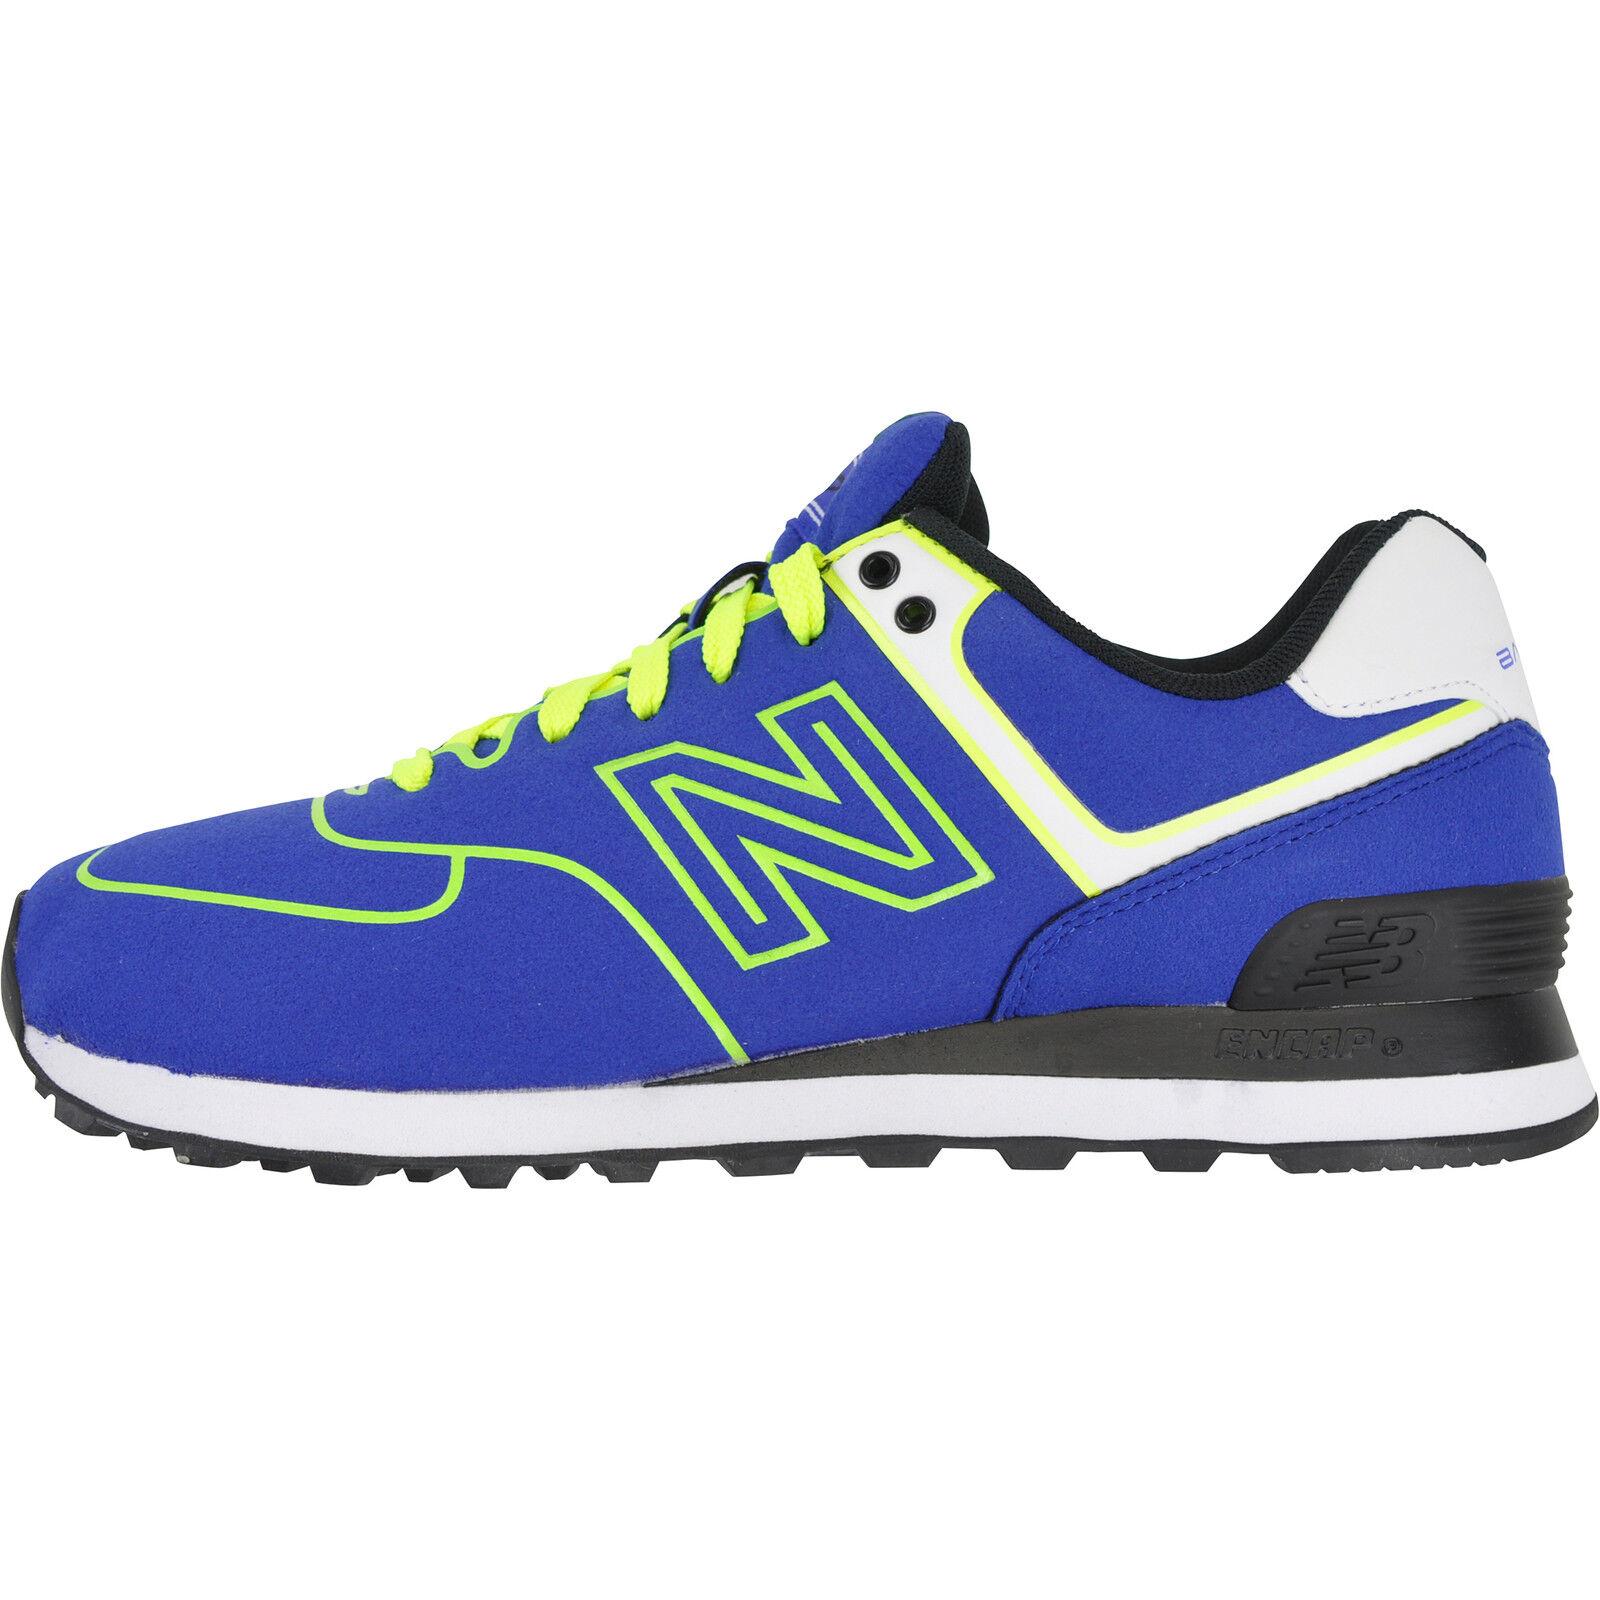 New Balance ML574 WL574 M576 H754 M373 Turnschuhe Lifestyle Laufschuhe Laufschuhe Laufschuhe c607d3